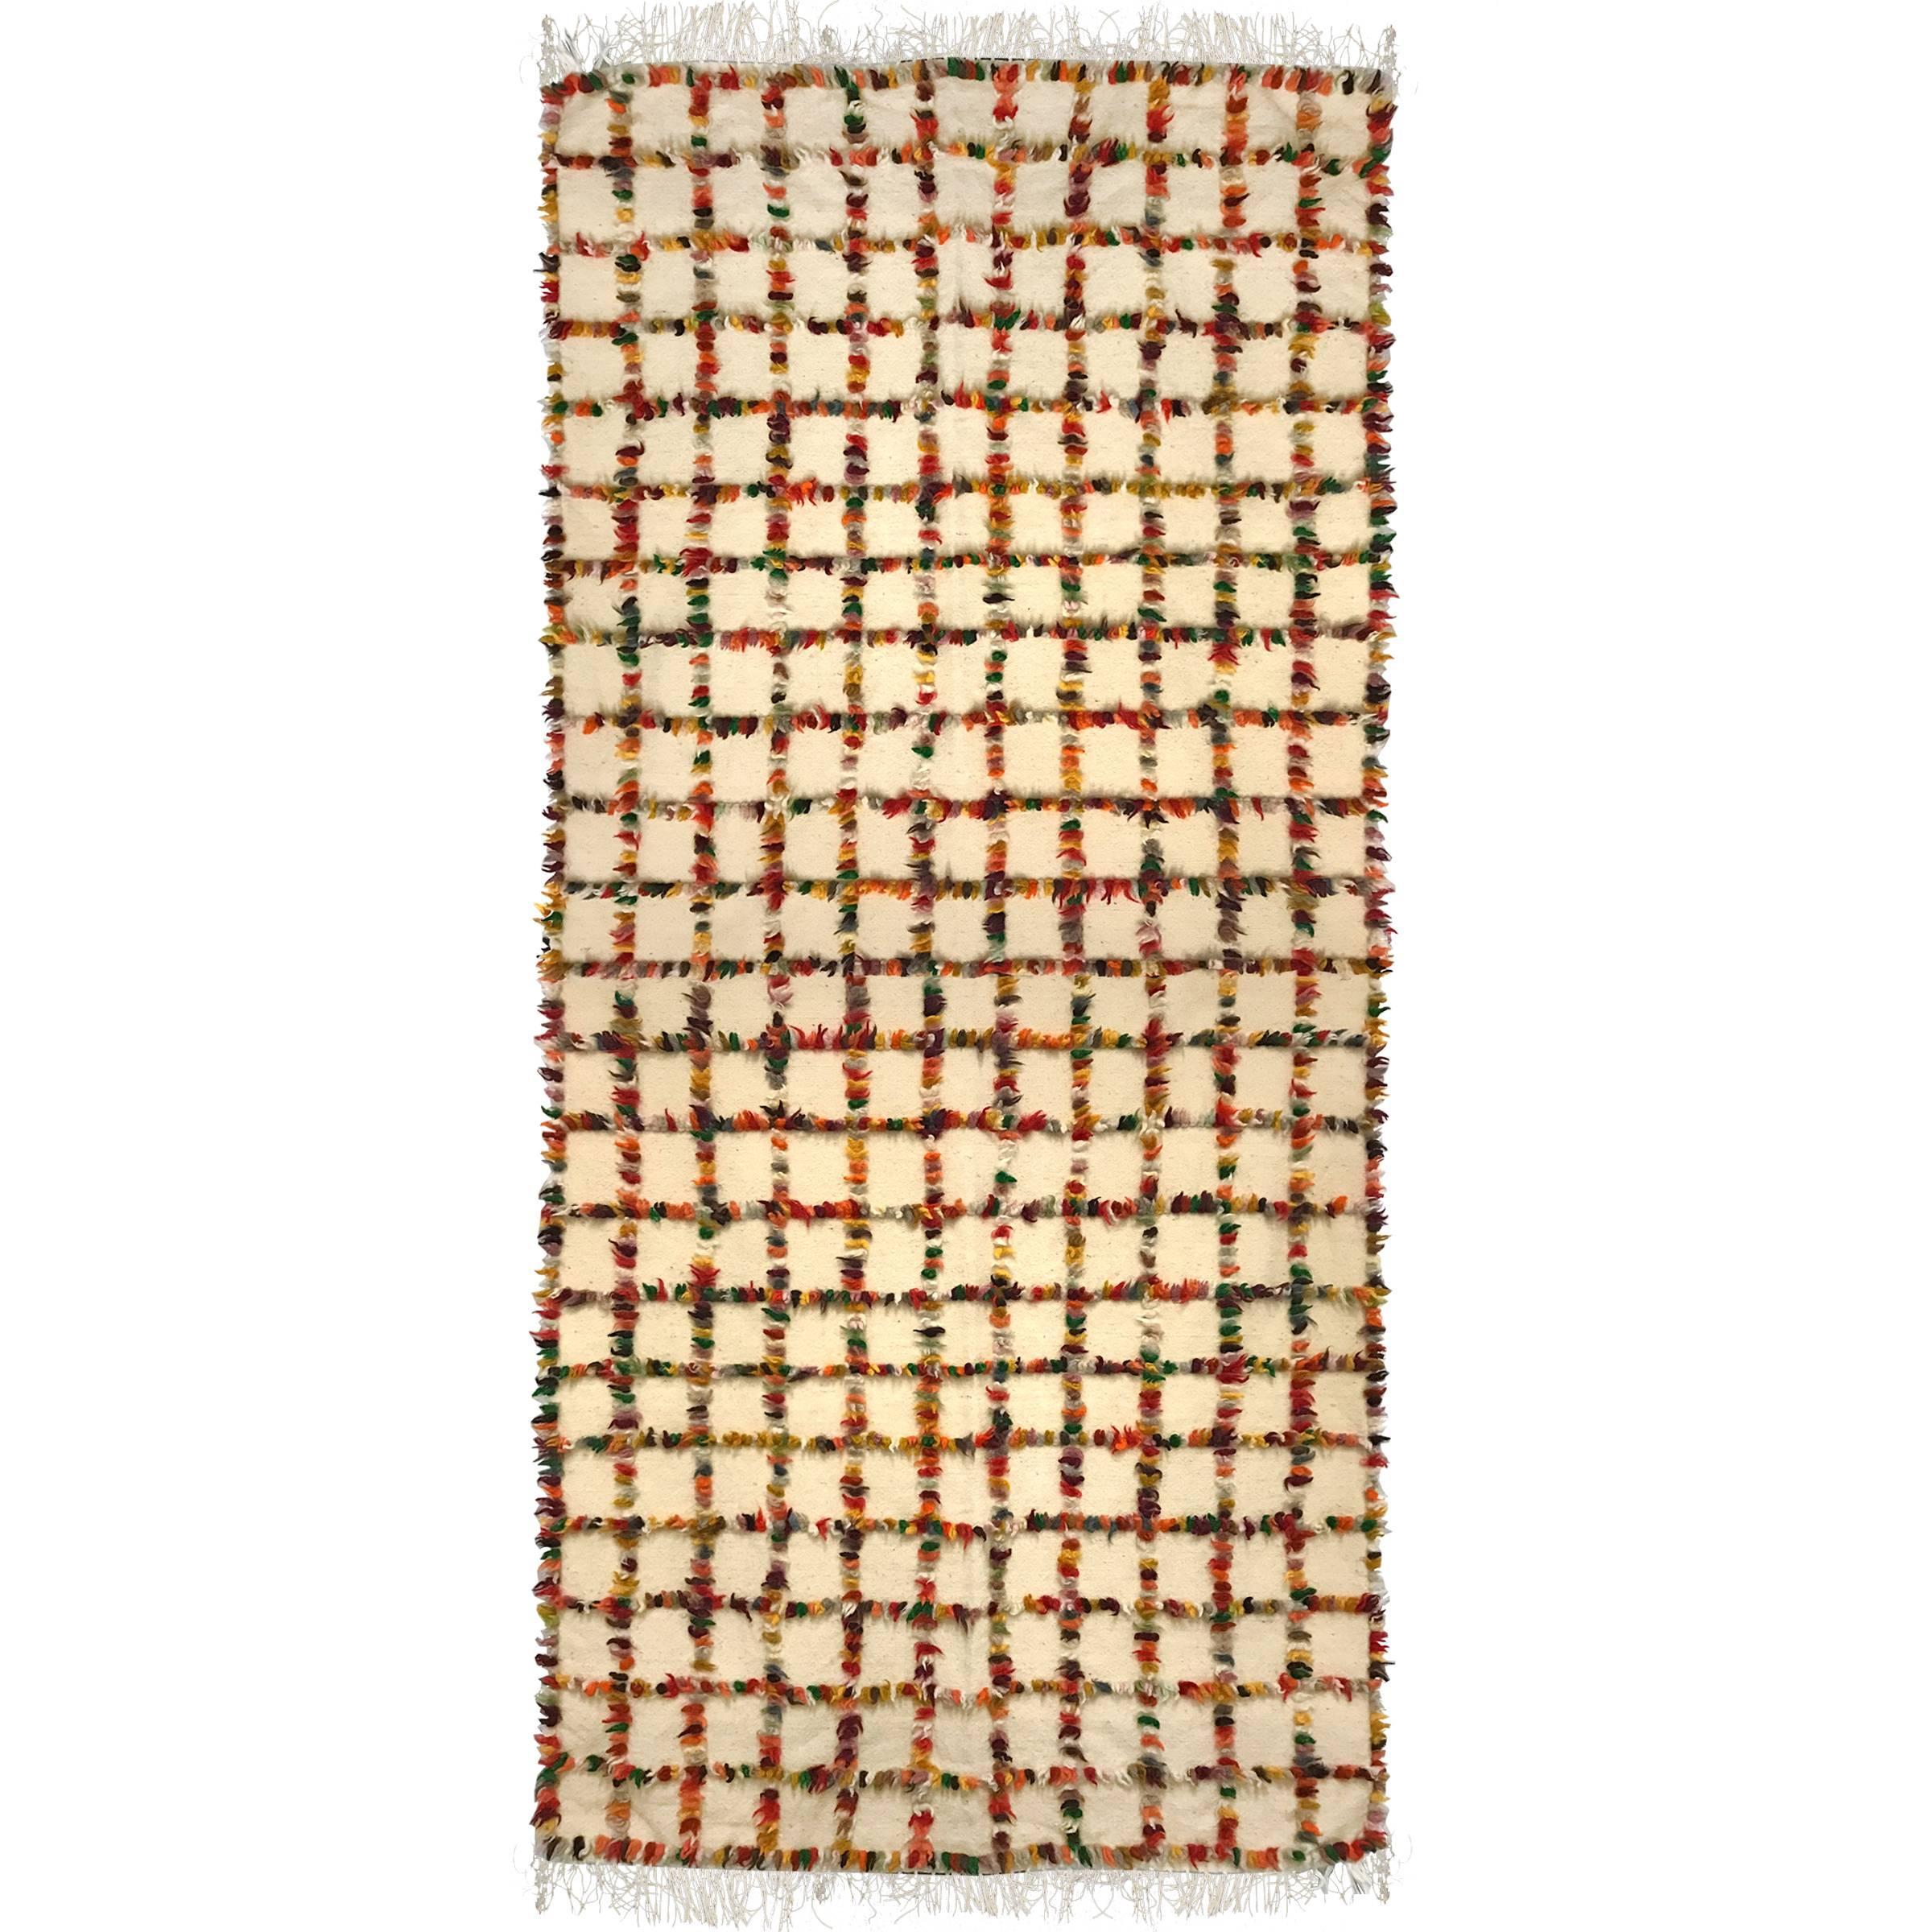 Vintage Turkish Tulu Blanket or Rug